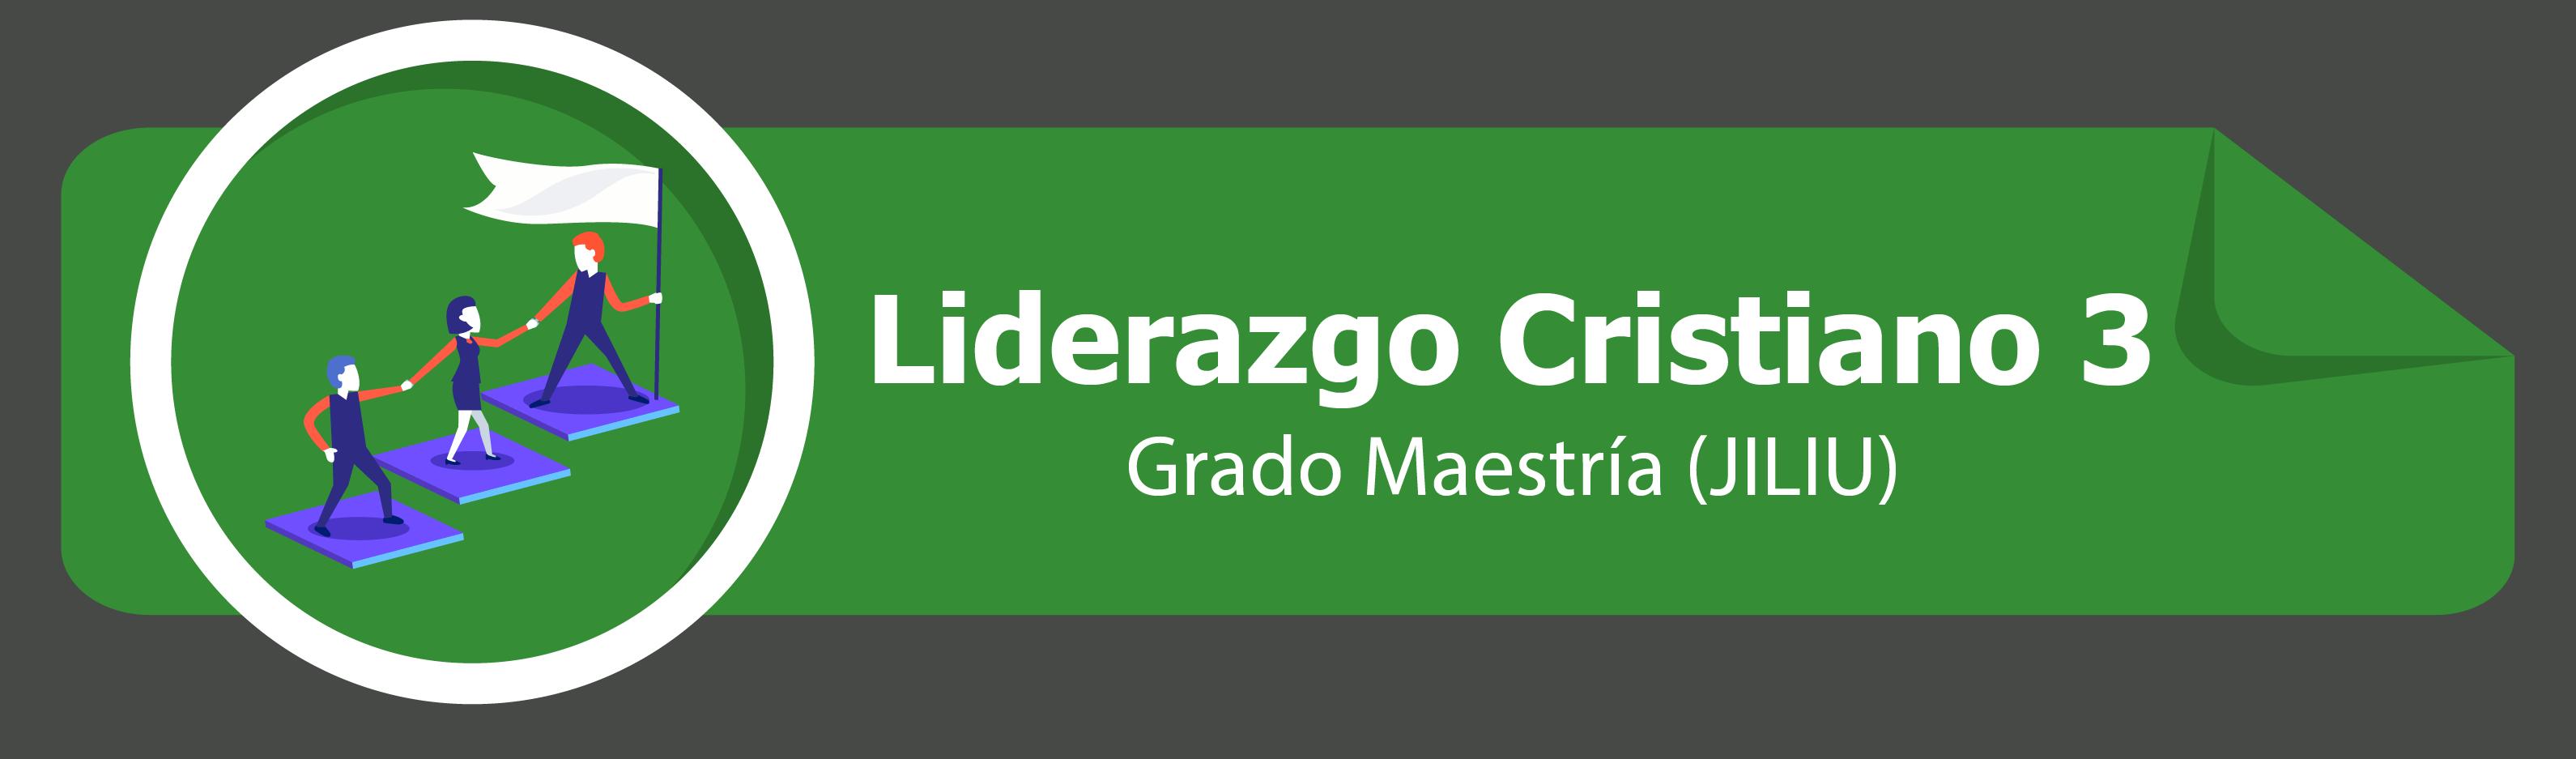 Liderazgo 3